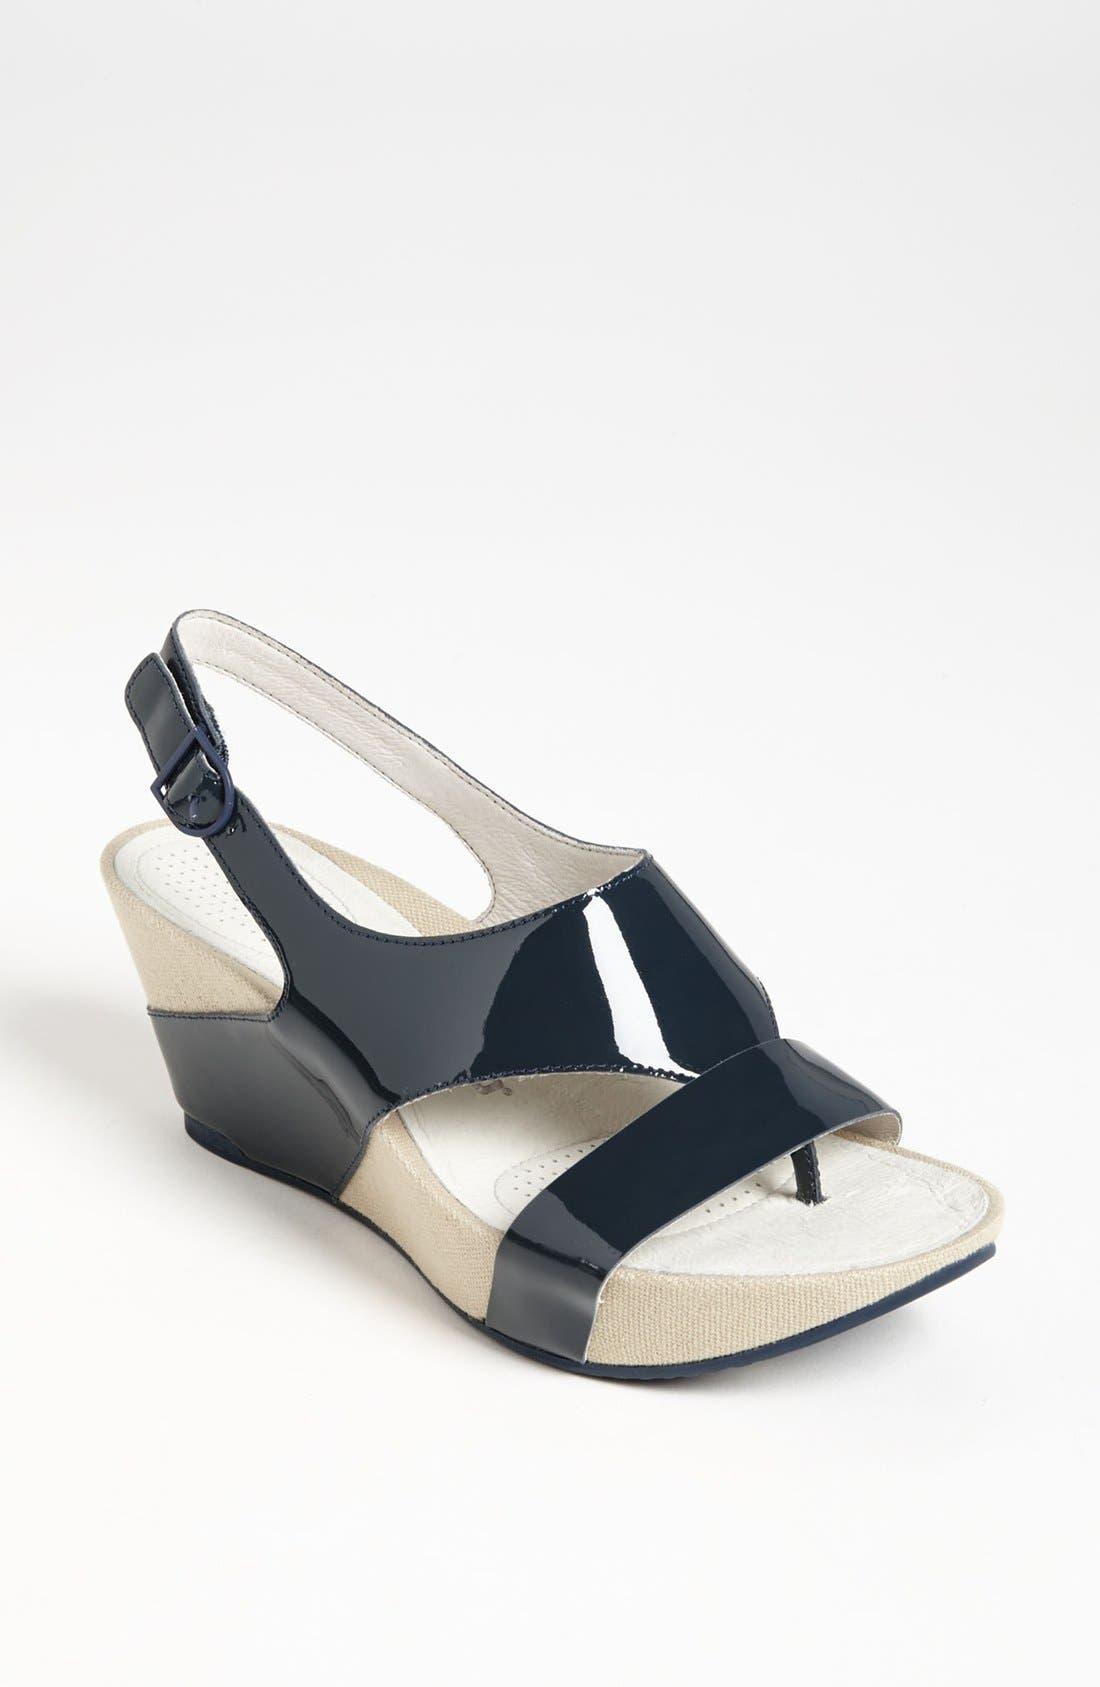 Alternate Image 1 Selected - Tsubo 'Olisa' Sandal